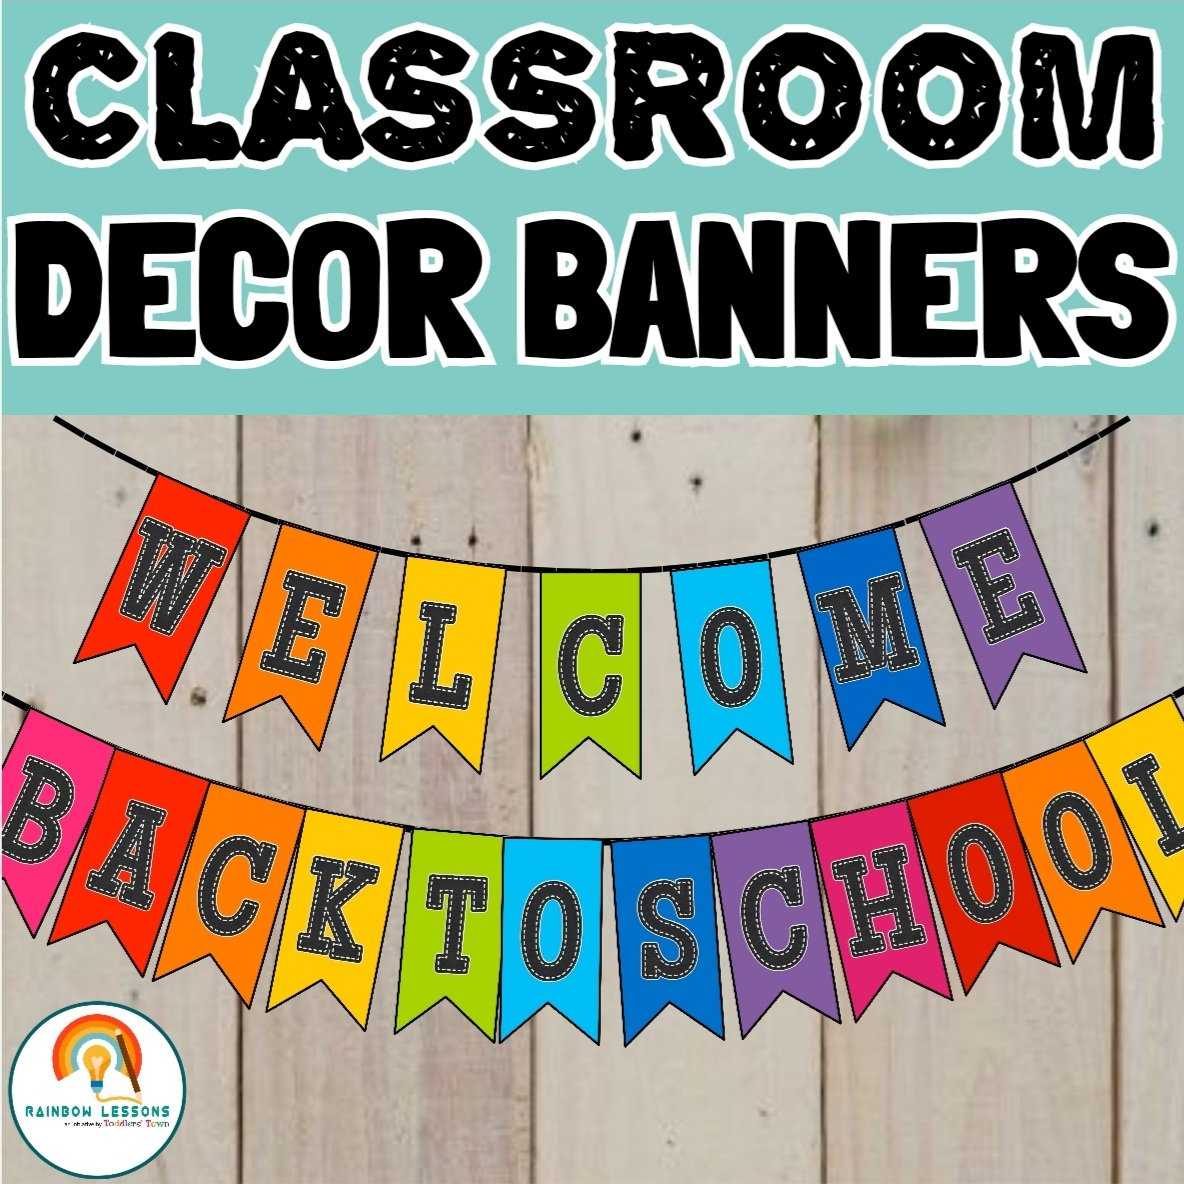 Classroom Welcome Banner Printable Decor